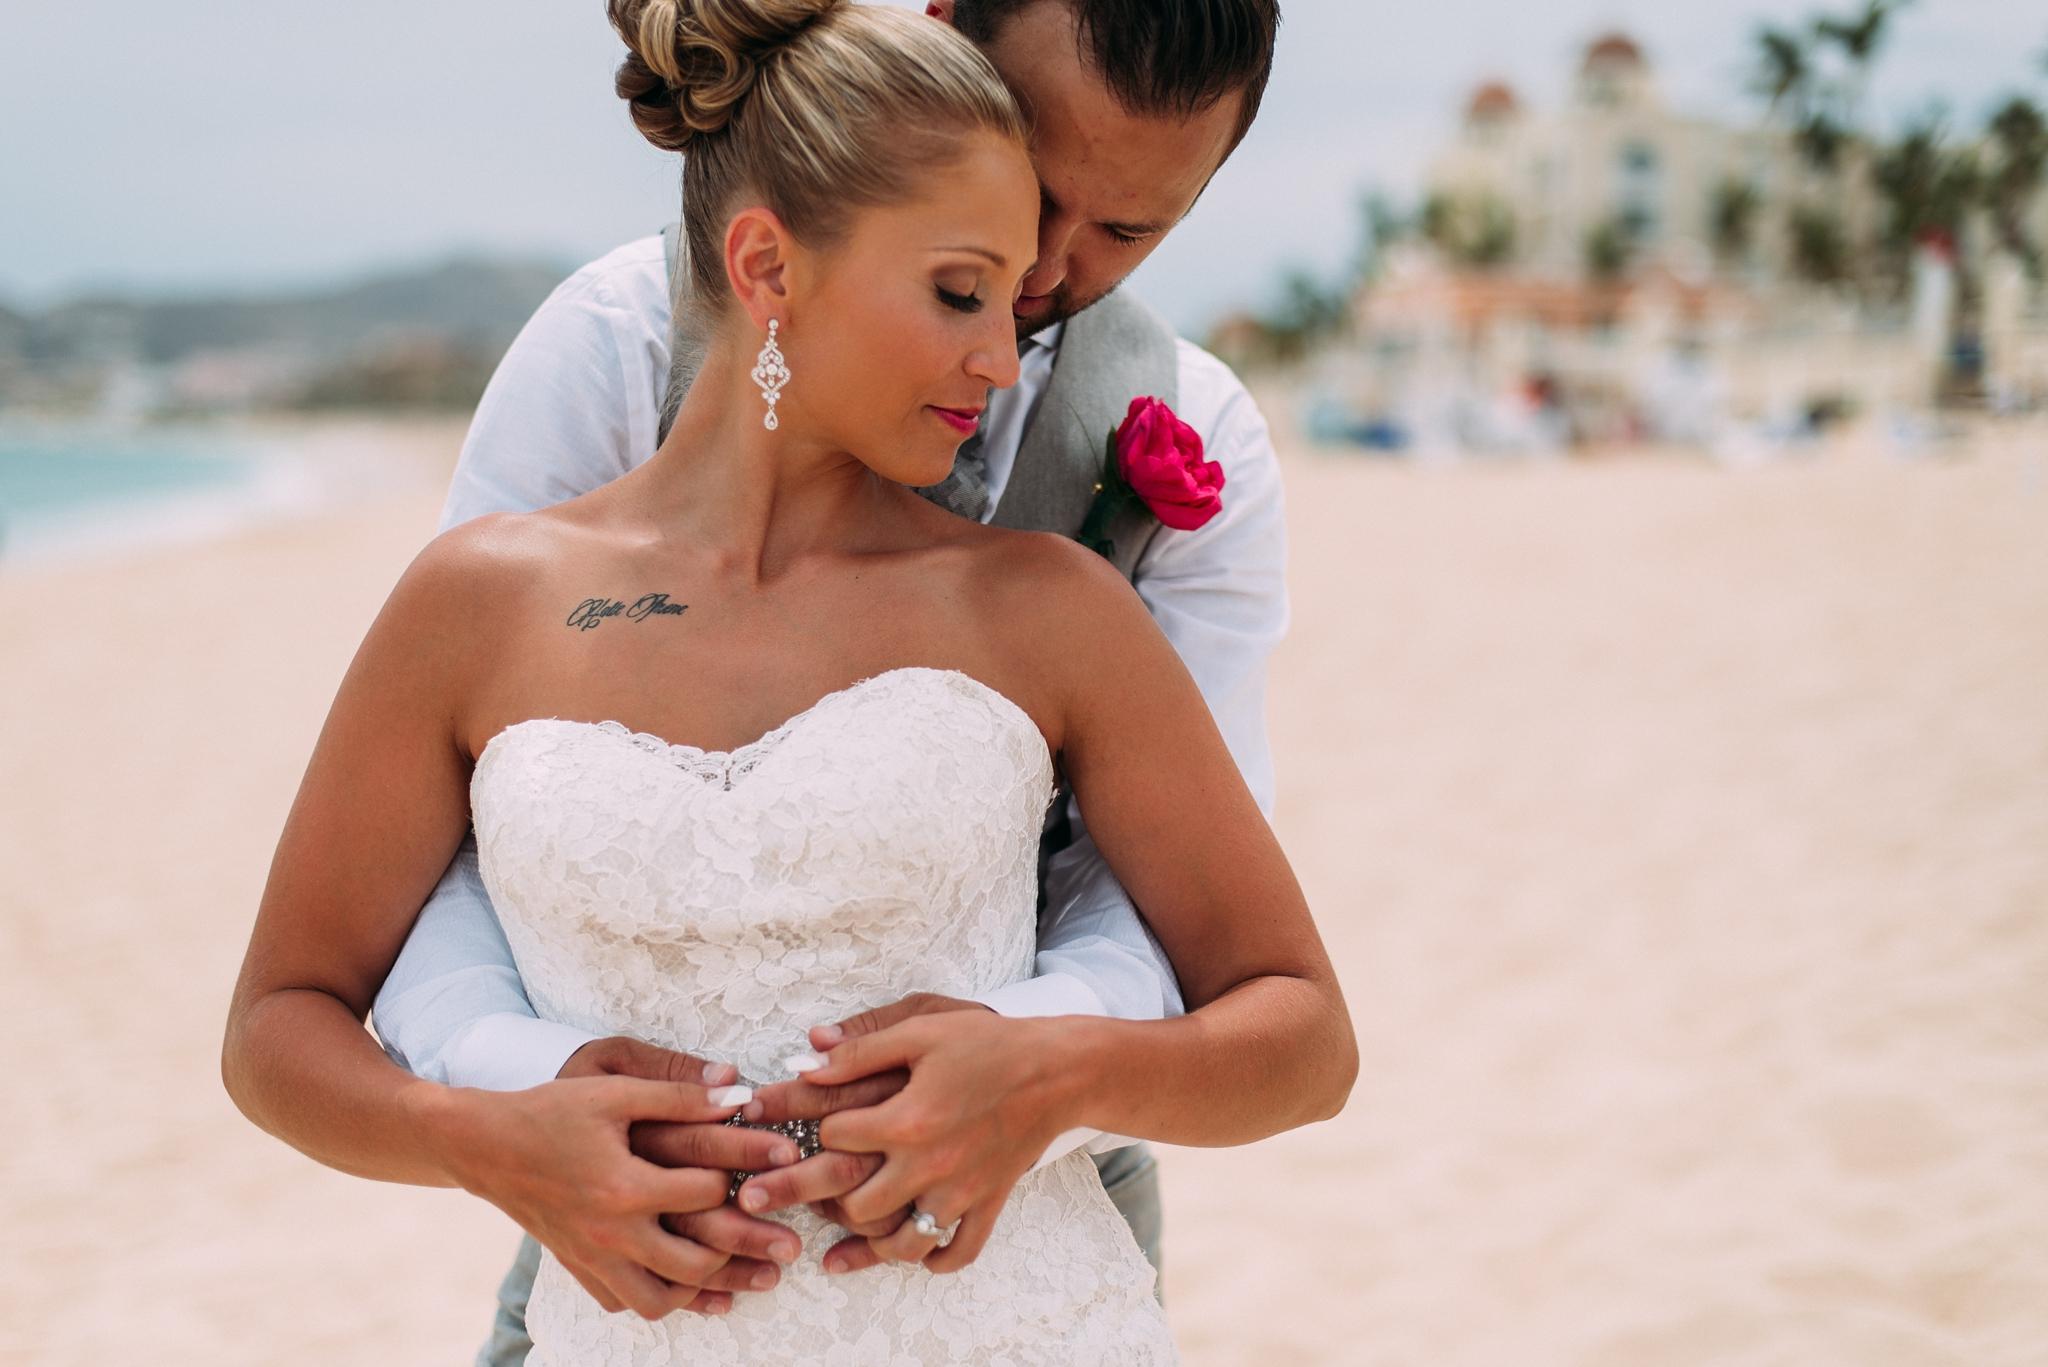 kaihla_tonai_intimate_wedding_elopement_photographer_1373